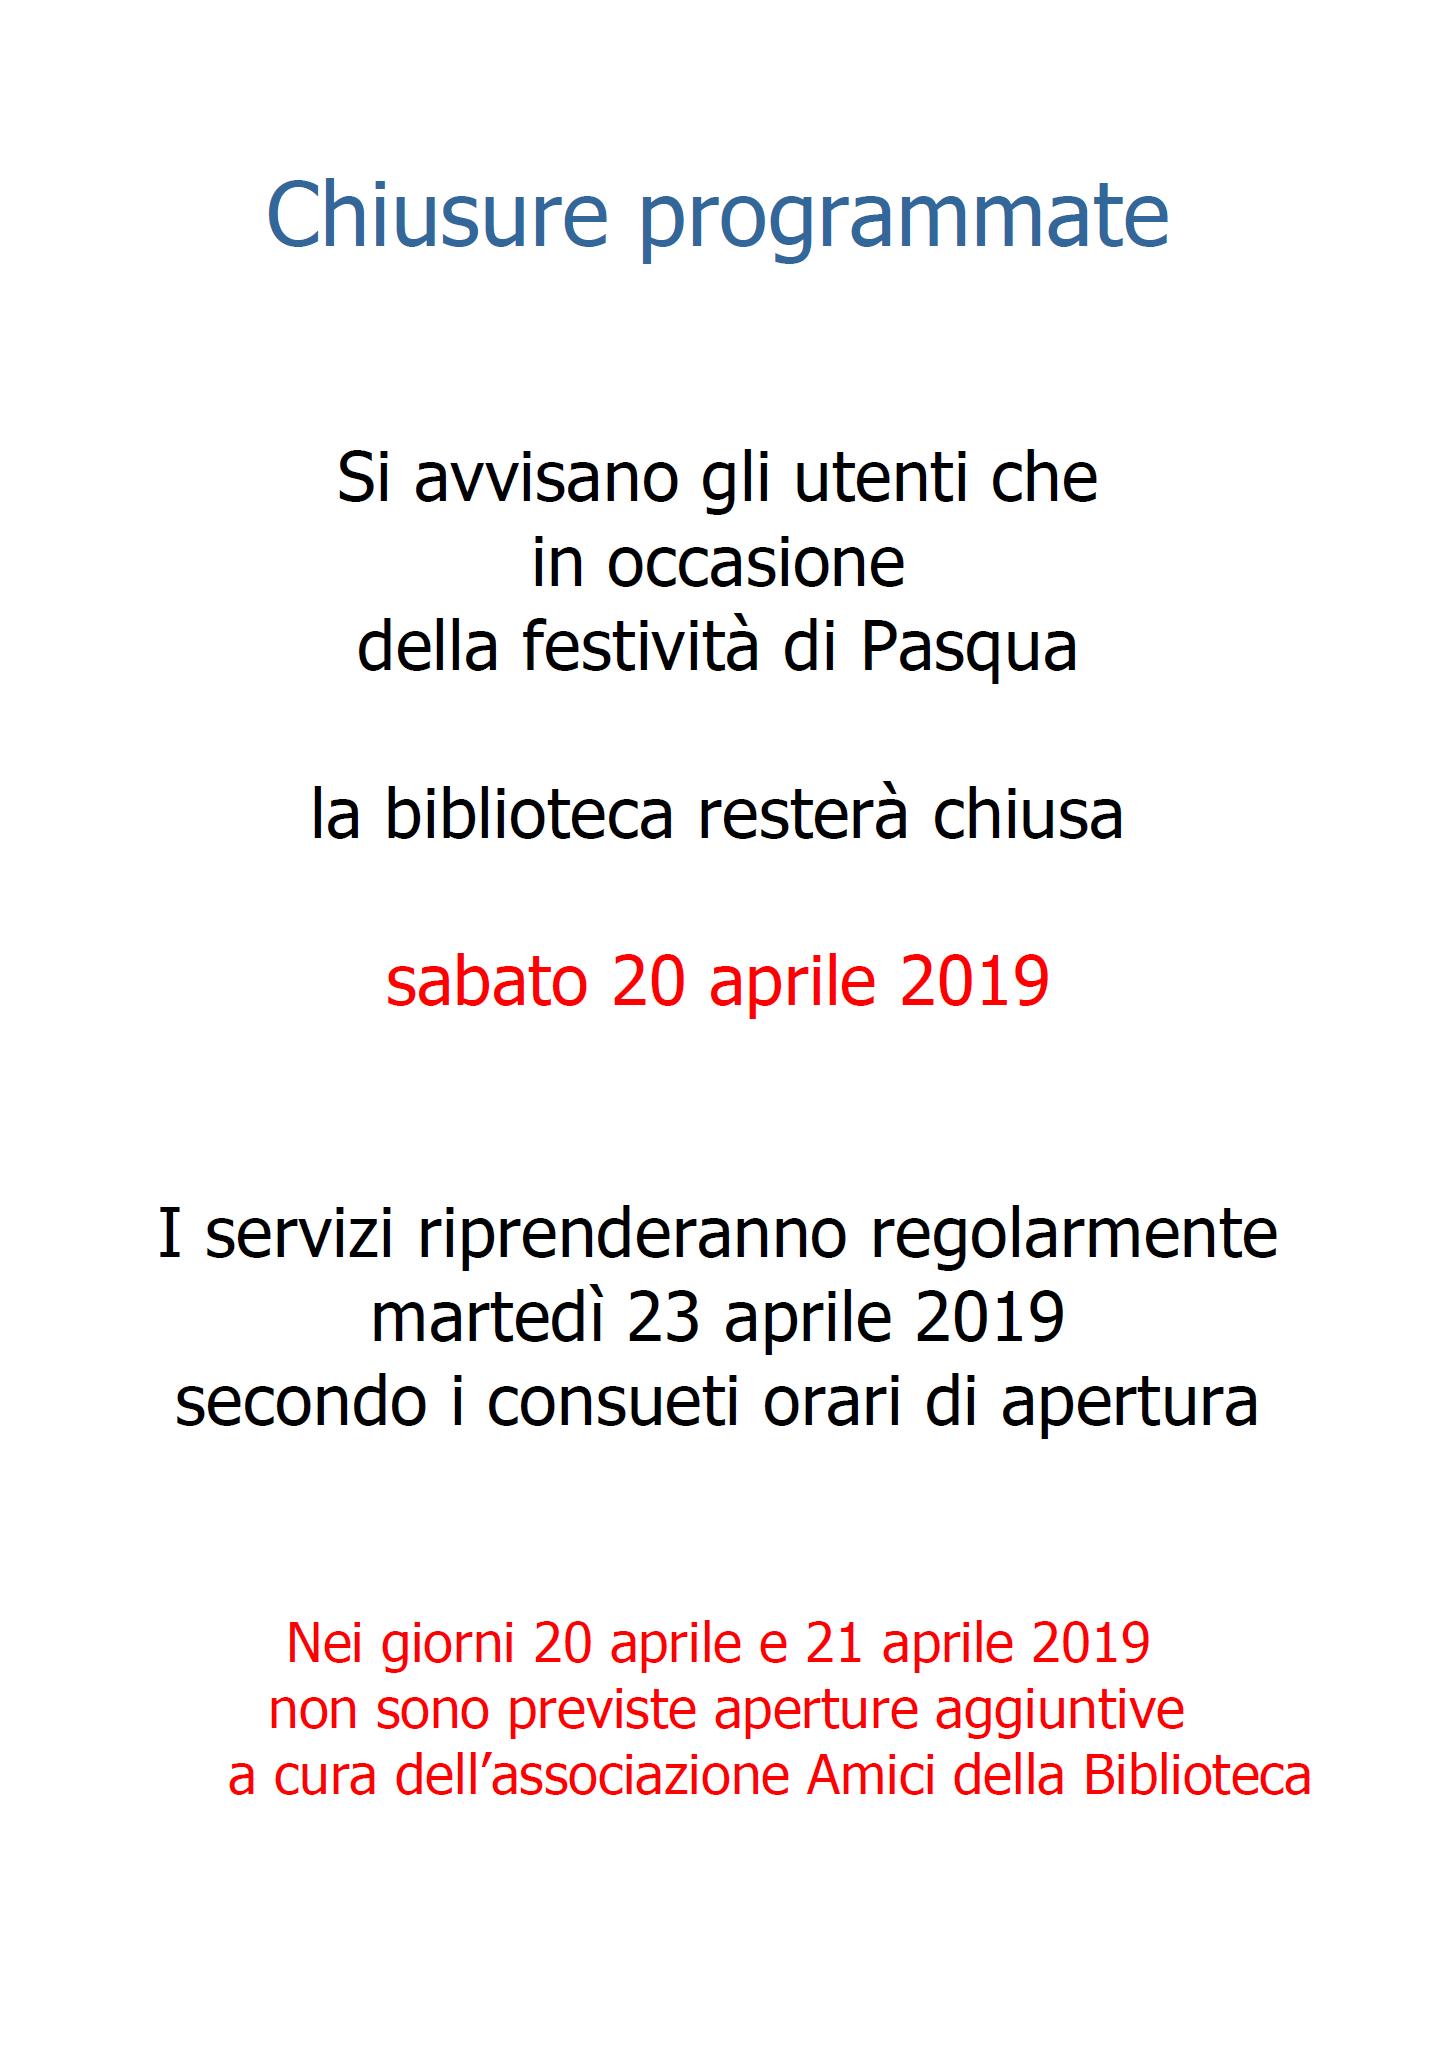 chiusura di Pasqua